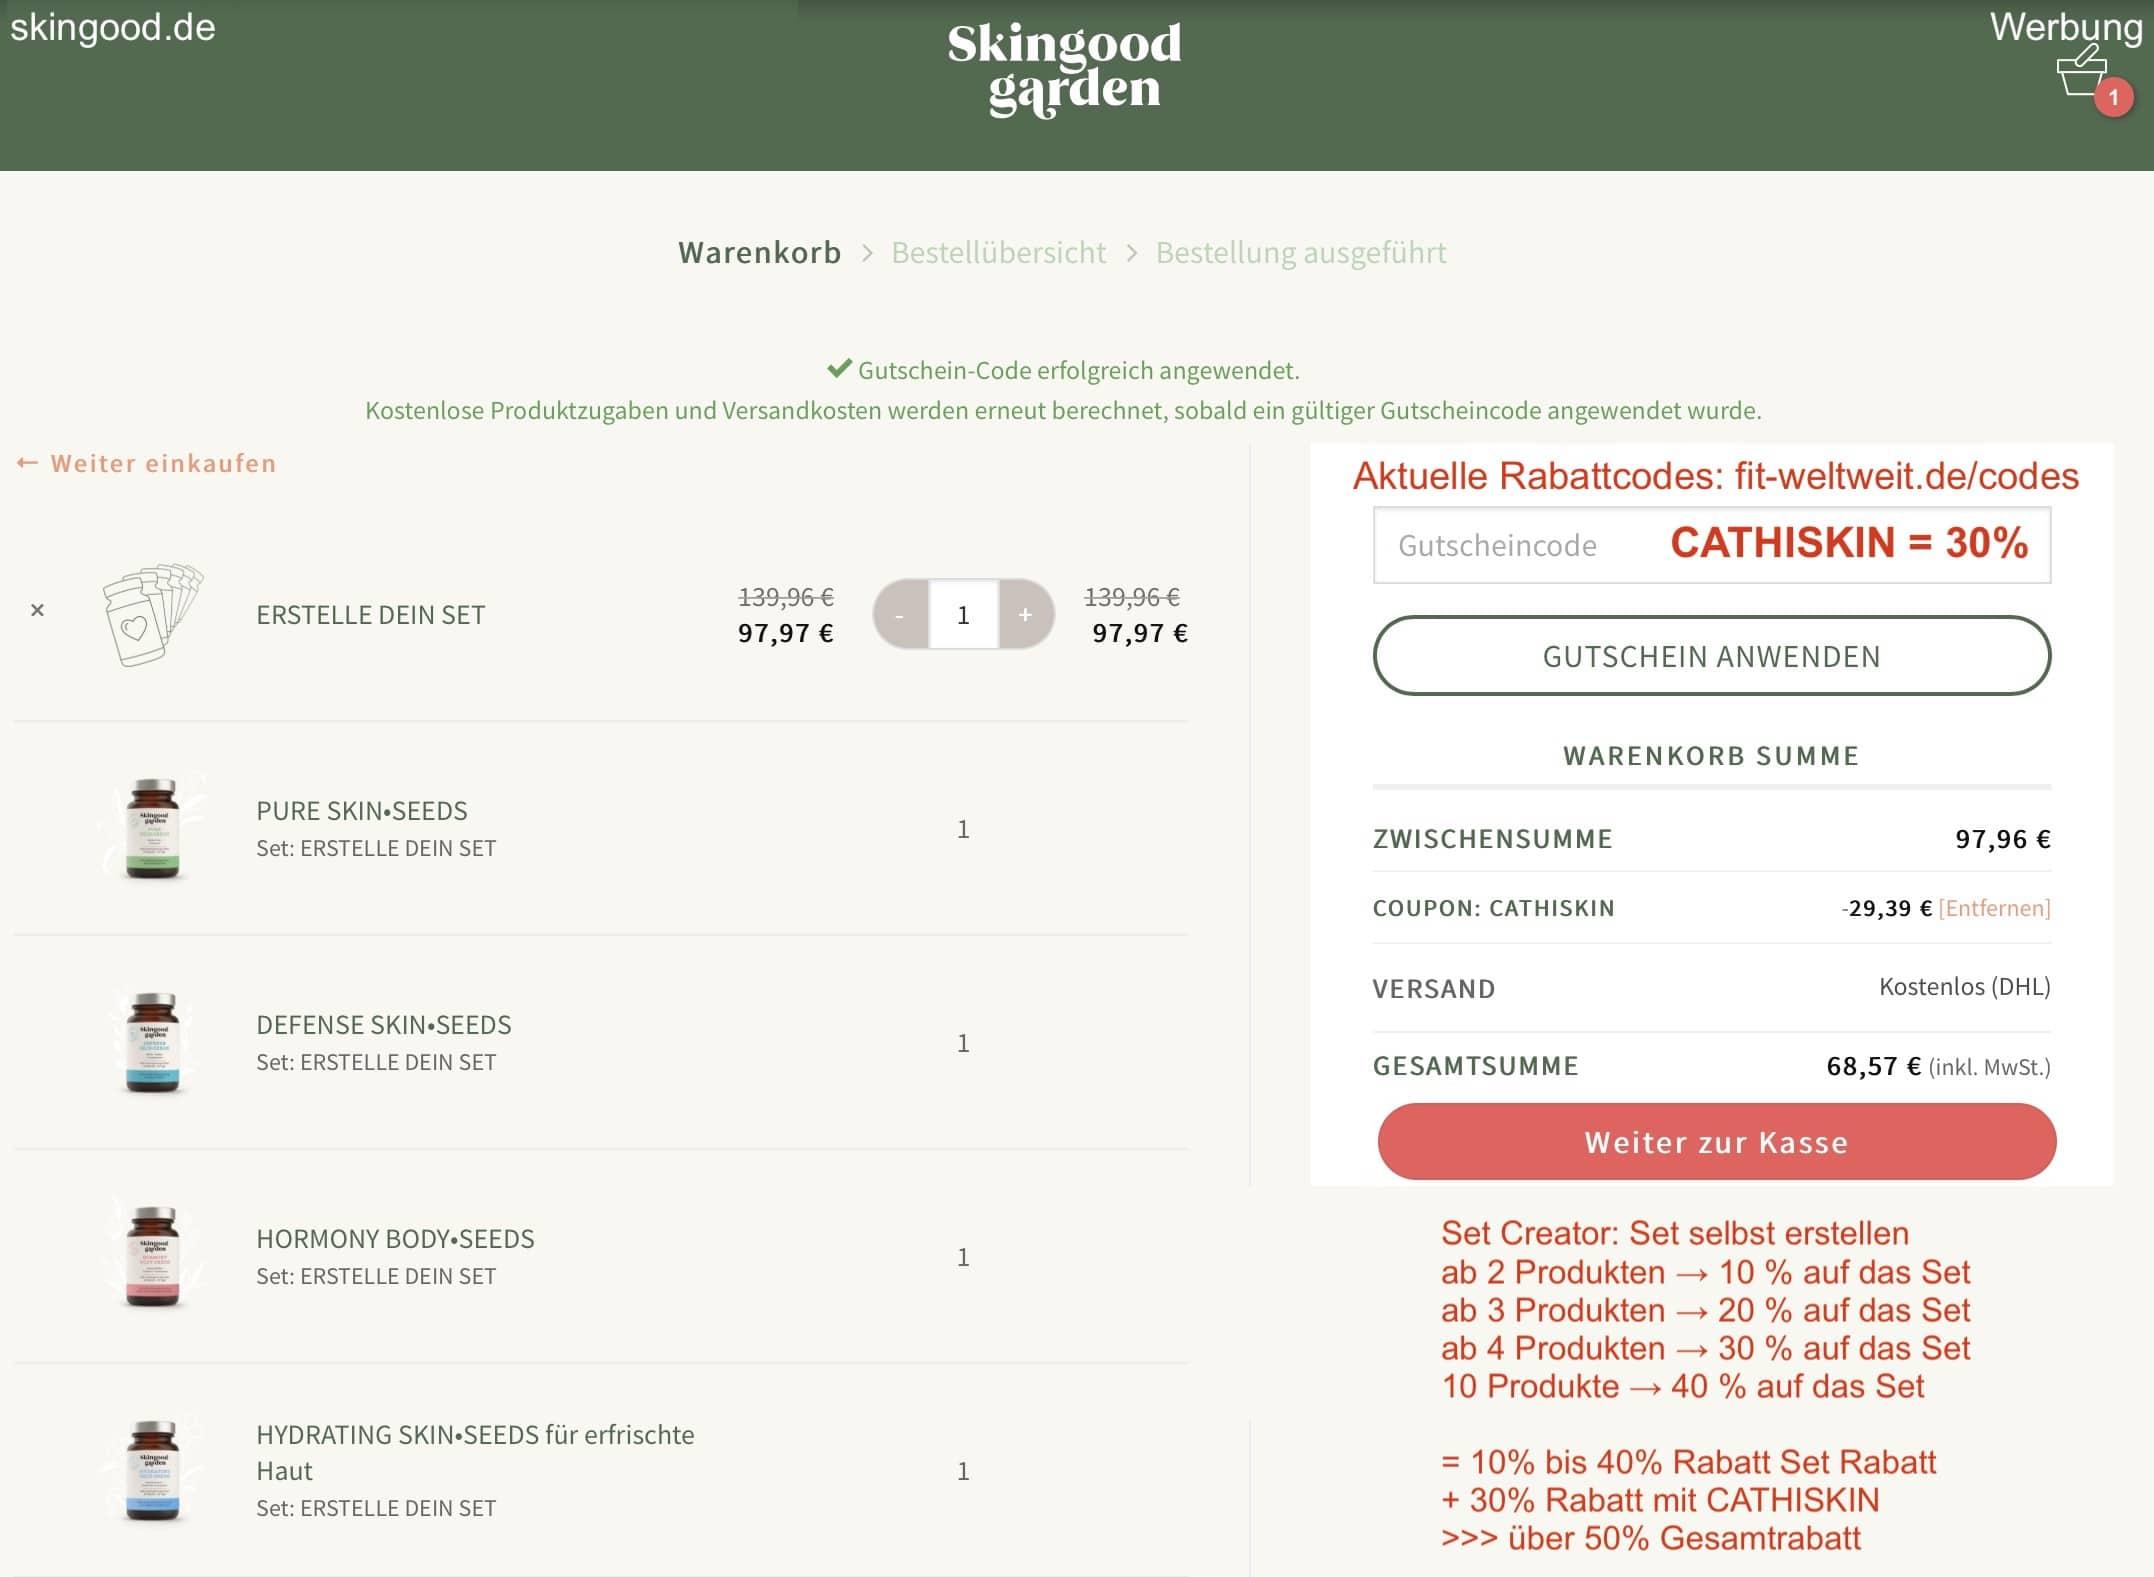 SKINGOOD GARDEN CODE 30% GUTSCHEIN SET CREATOR 40% RABATT